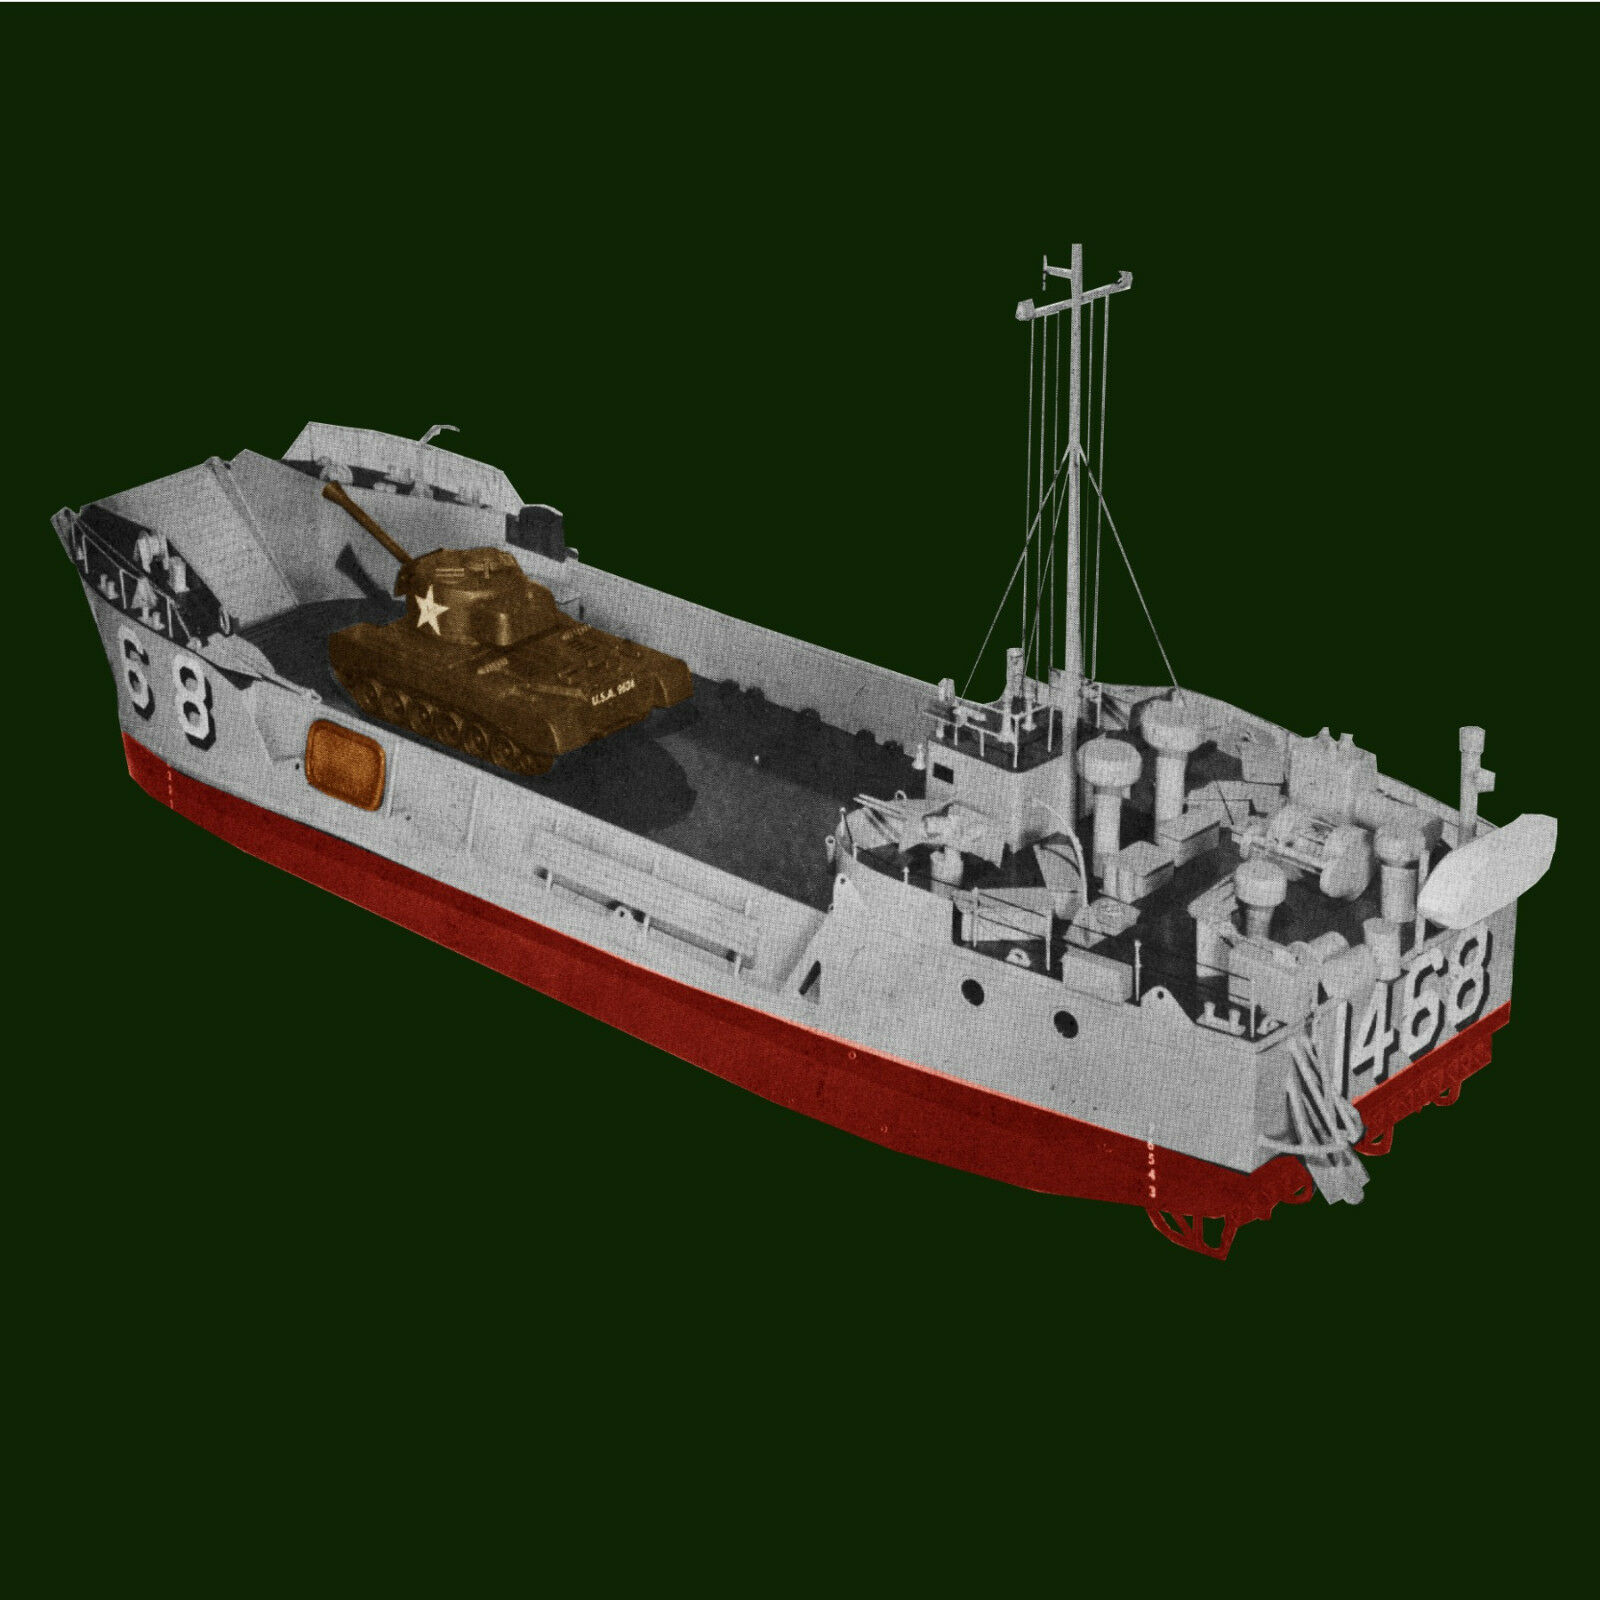 Radio Control Model Boat Plans - Bing images